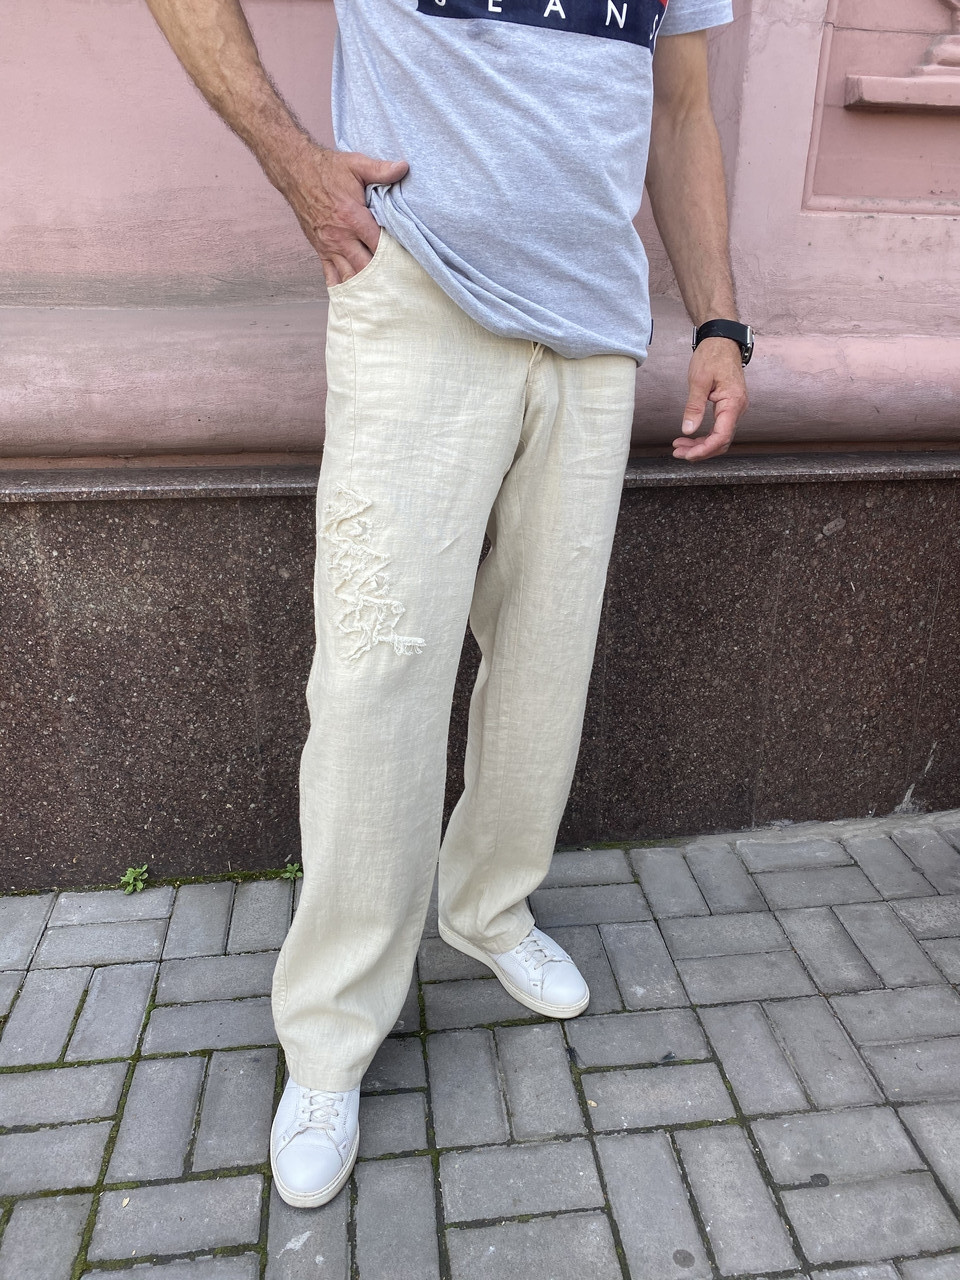 Джинсы  Doramafi мужские лен лето беж с аппликацией оригинал